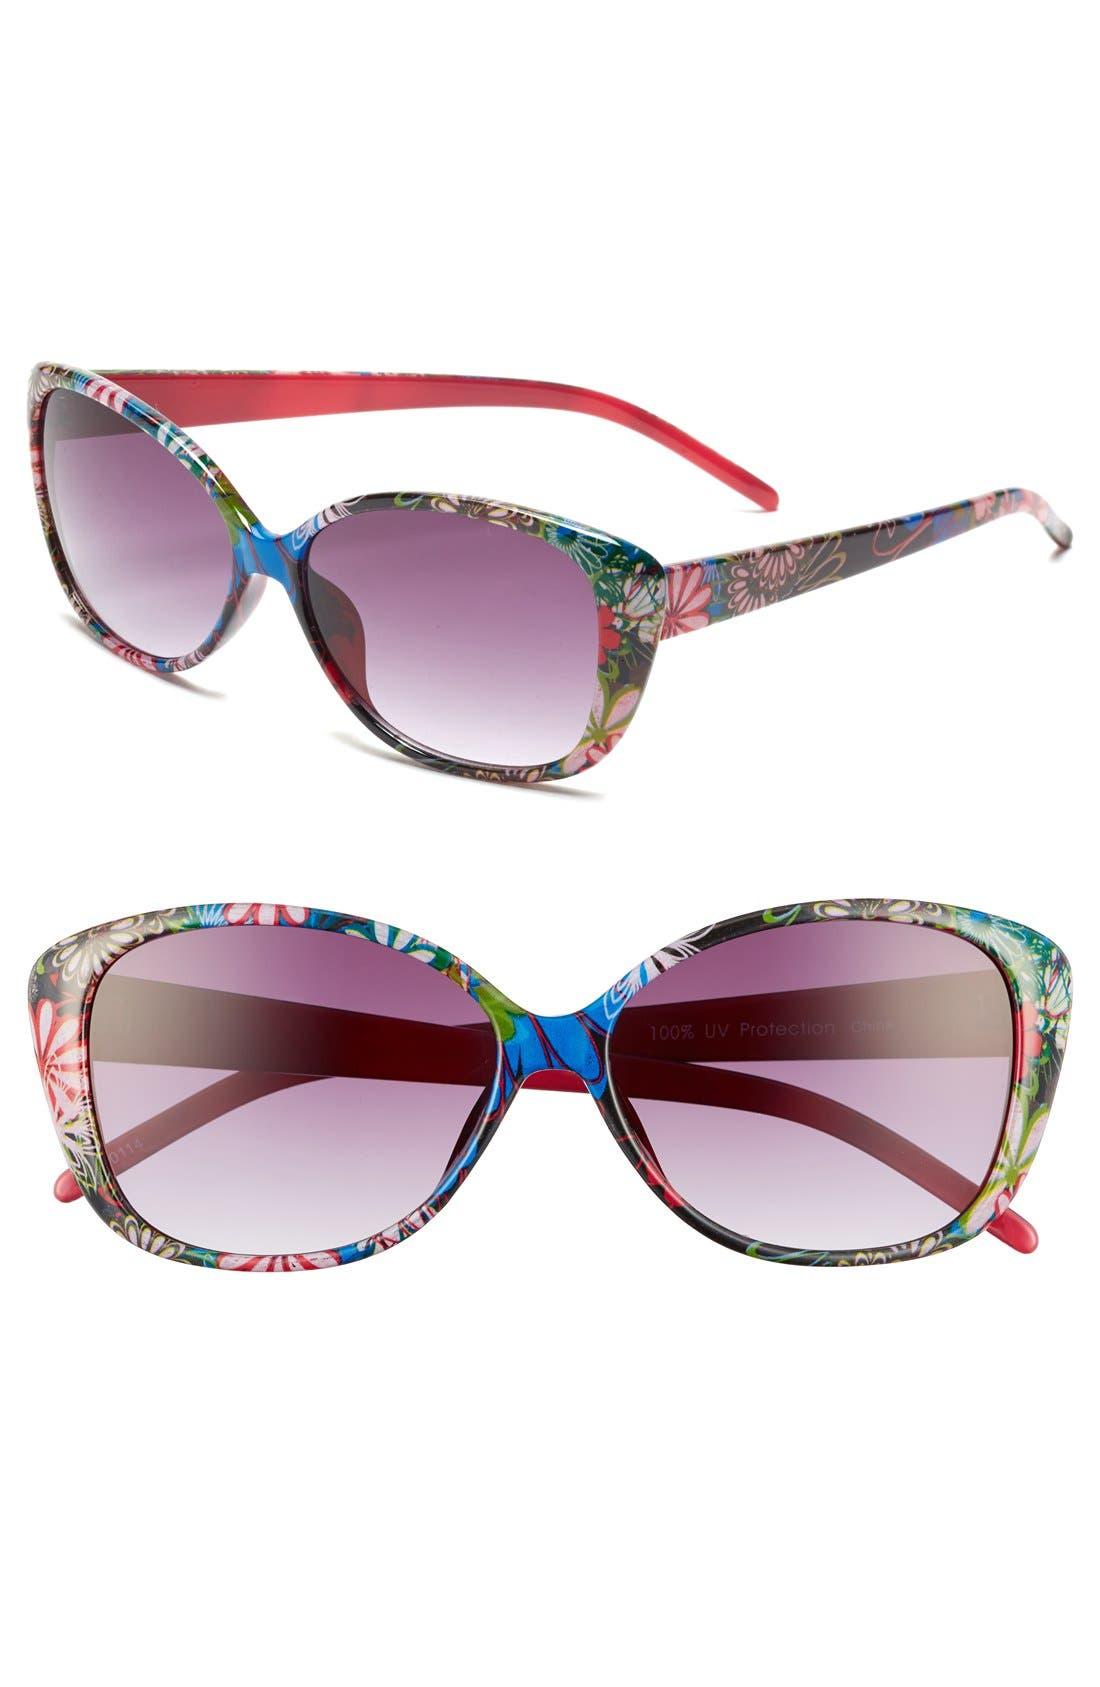 Main Image - Fantas Eyes 'Sunset Strip' Sunglasses (Girls)